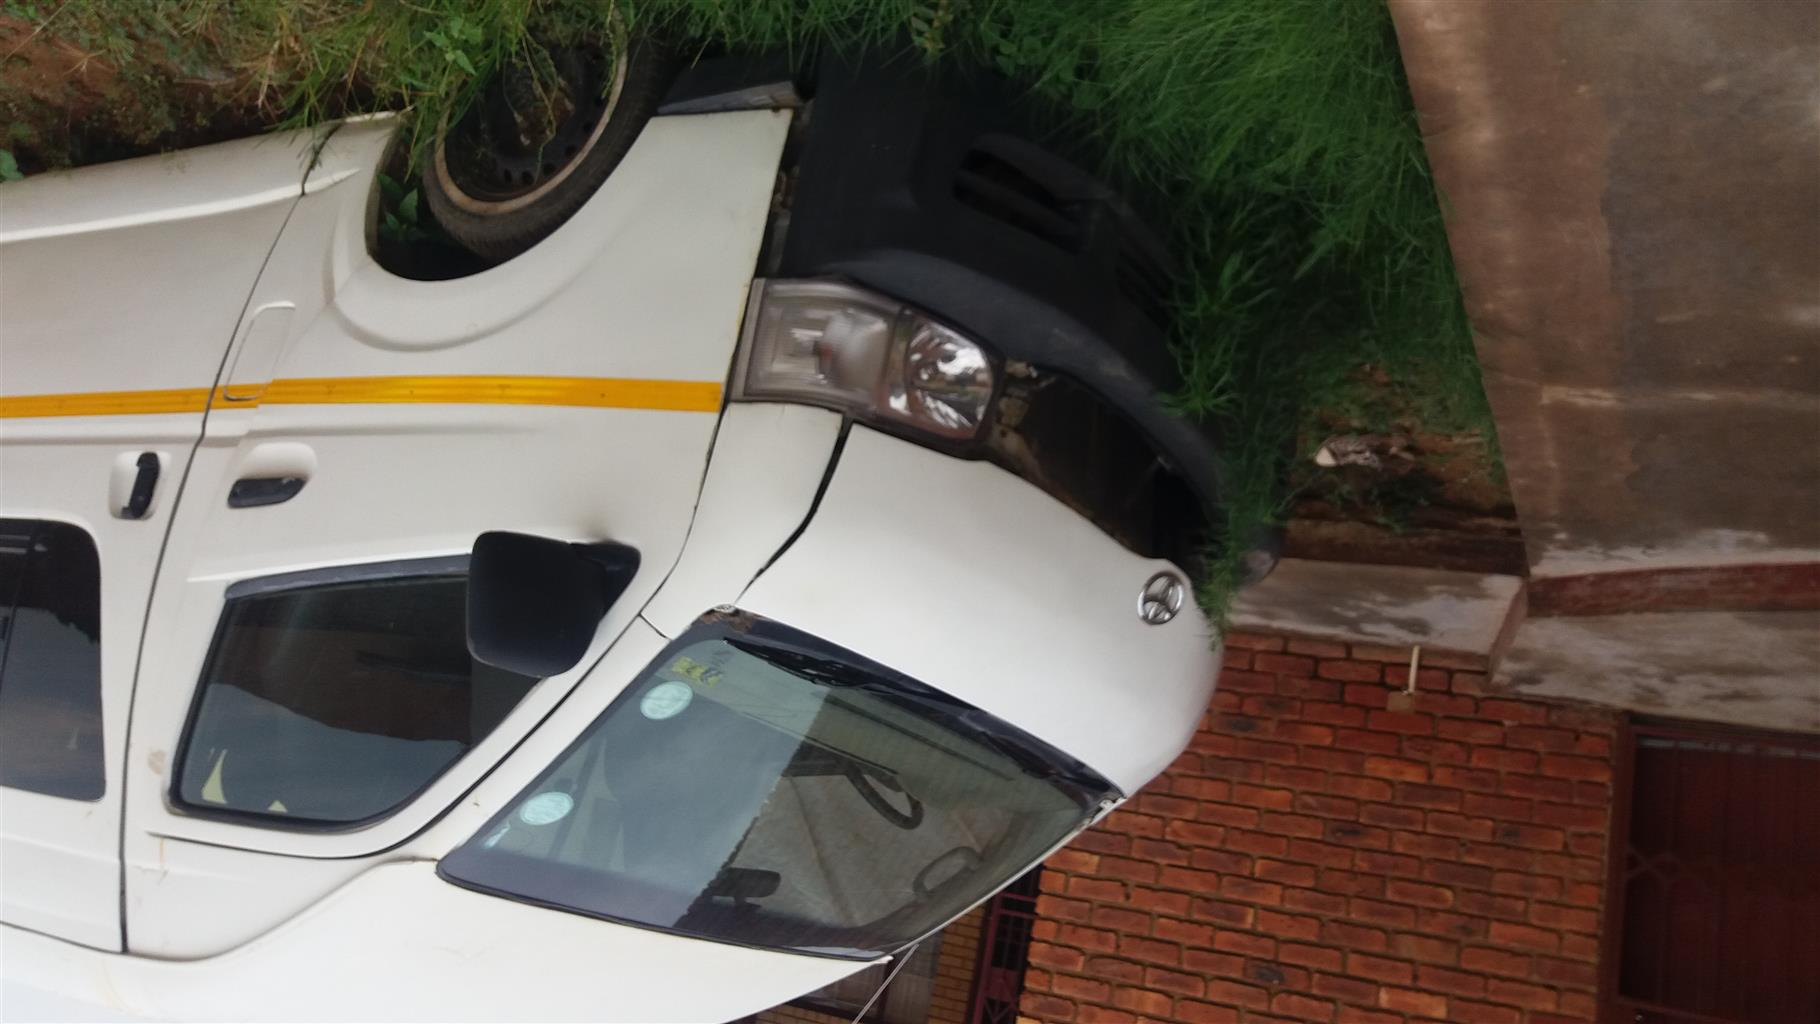 2008 Toyota Quantum Sesfikile QUANTUM 2.7 SESFIKILE 16s